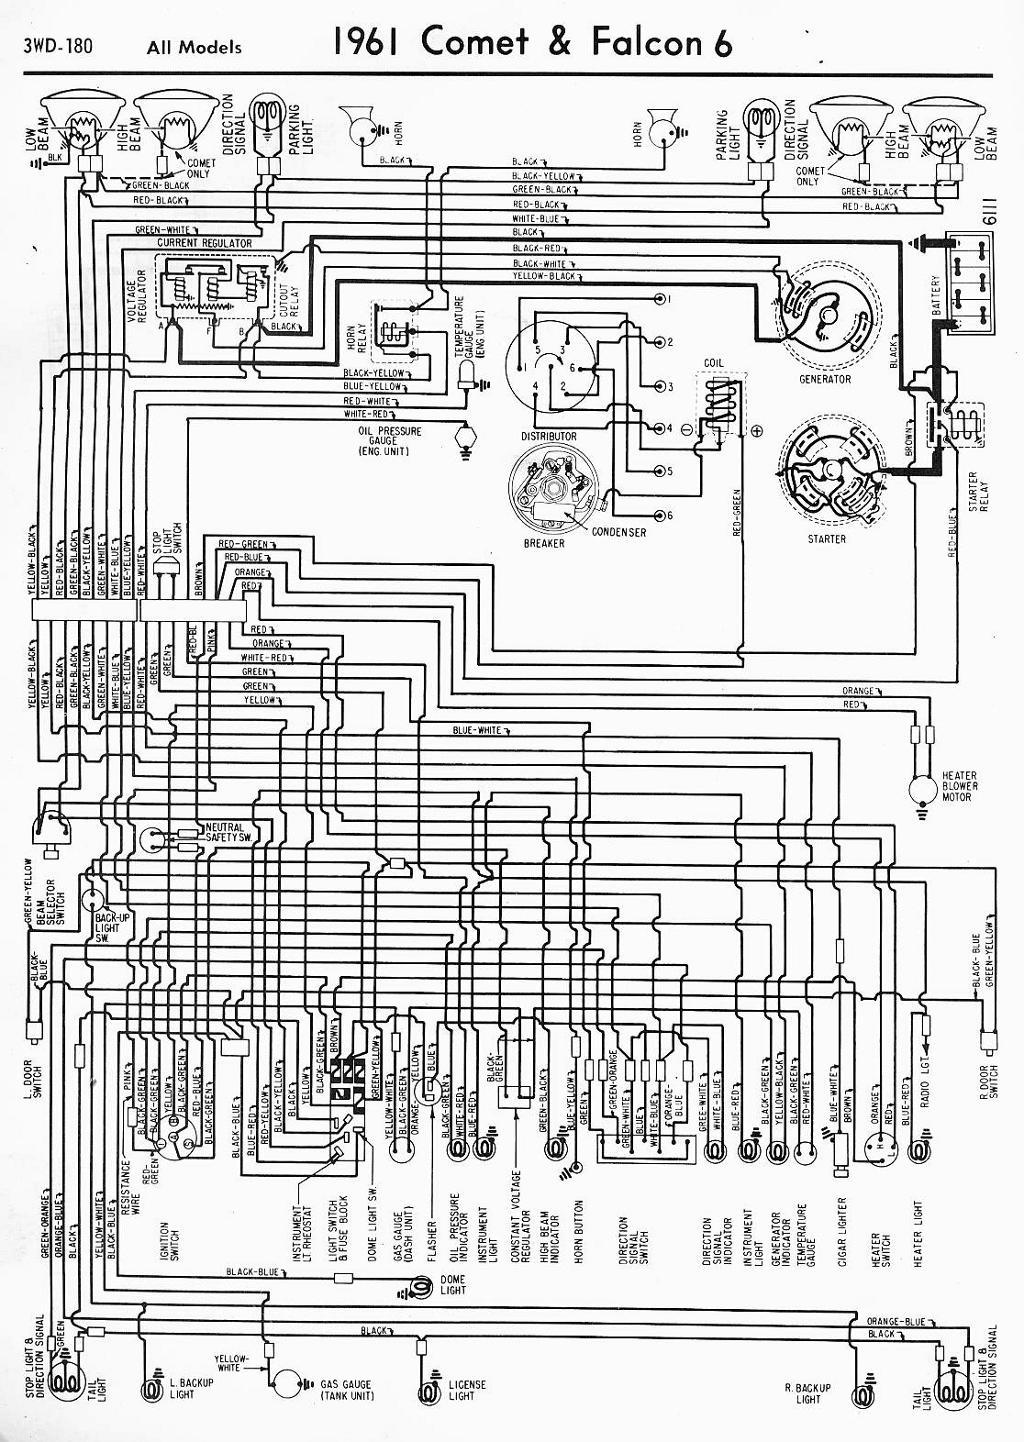 1968 Ford Ranchero Wiring Diagram Afci Breaker Wiring Diagram Bege Wiring Diagram